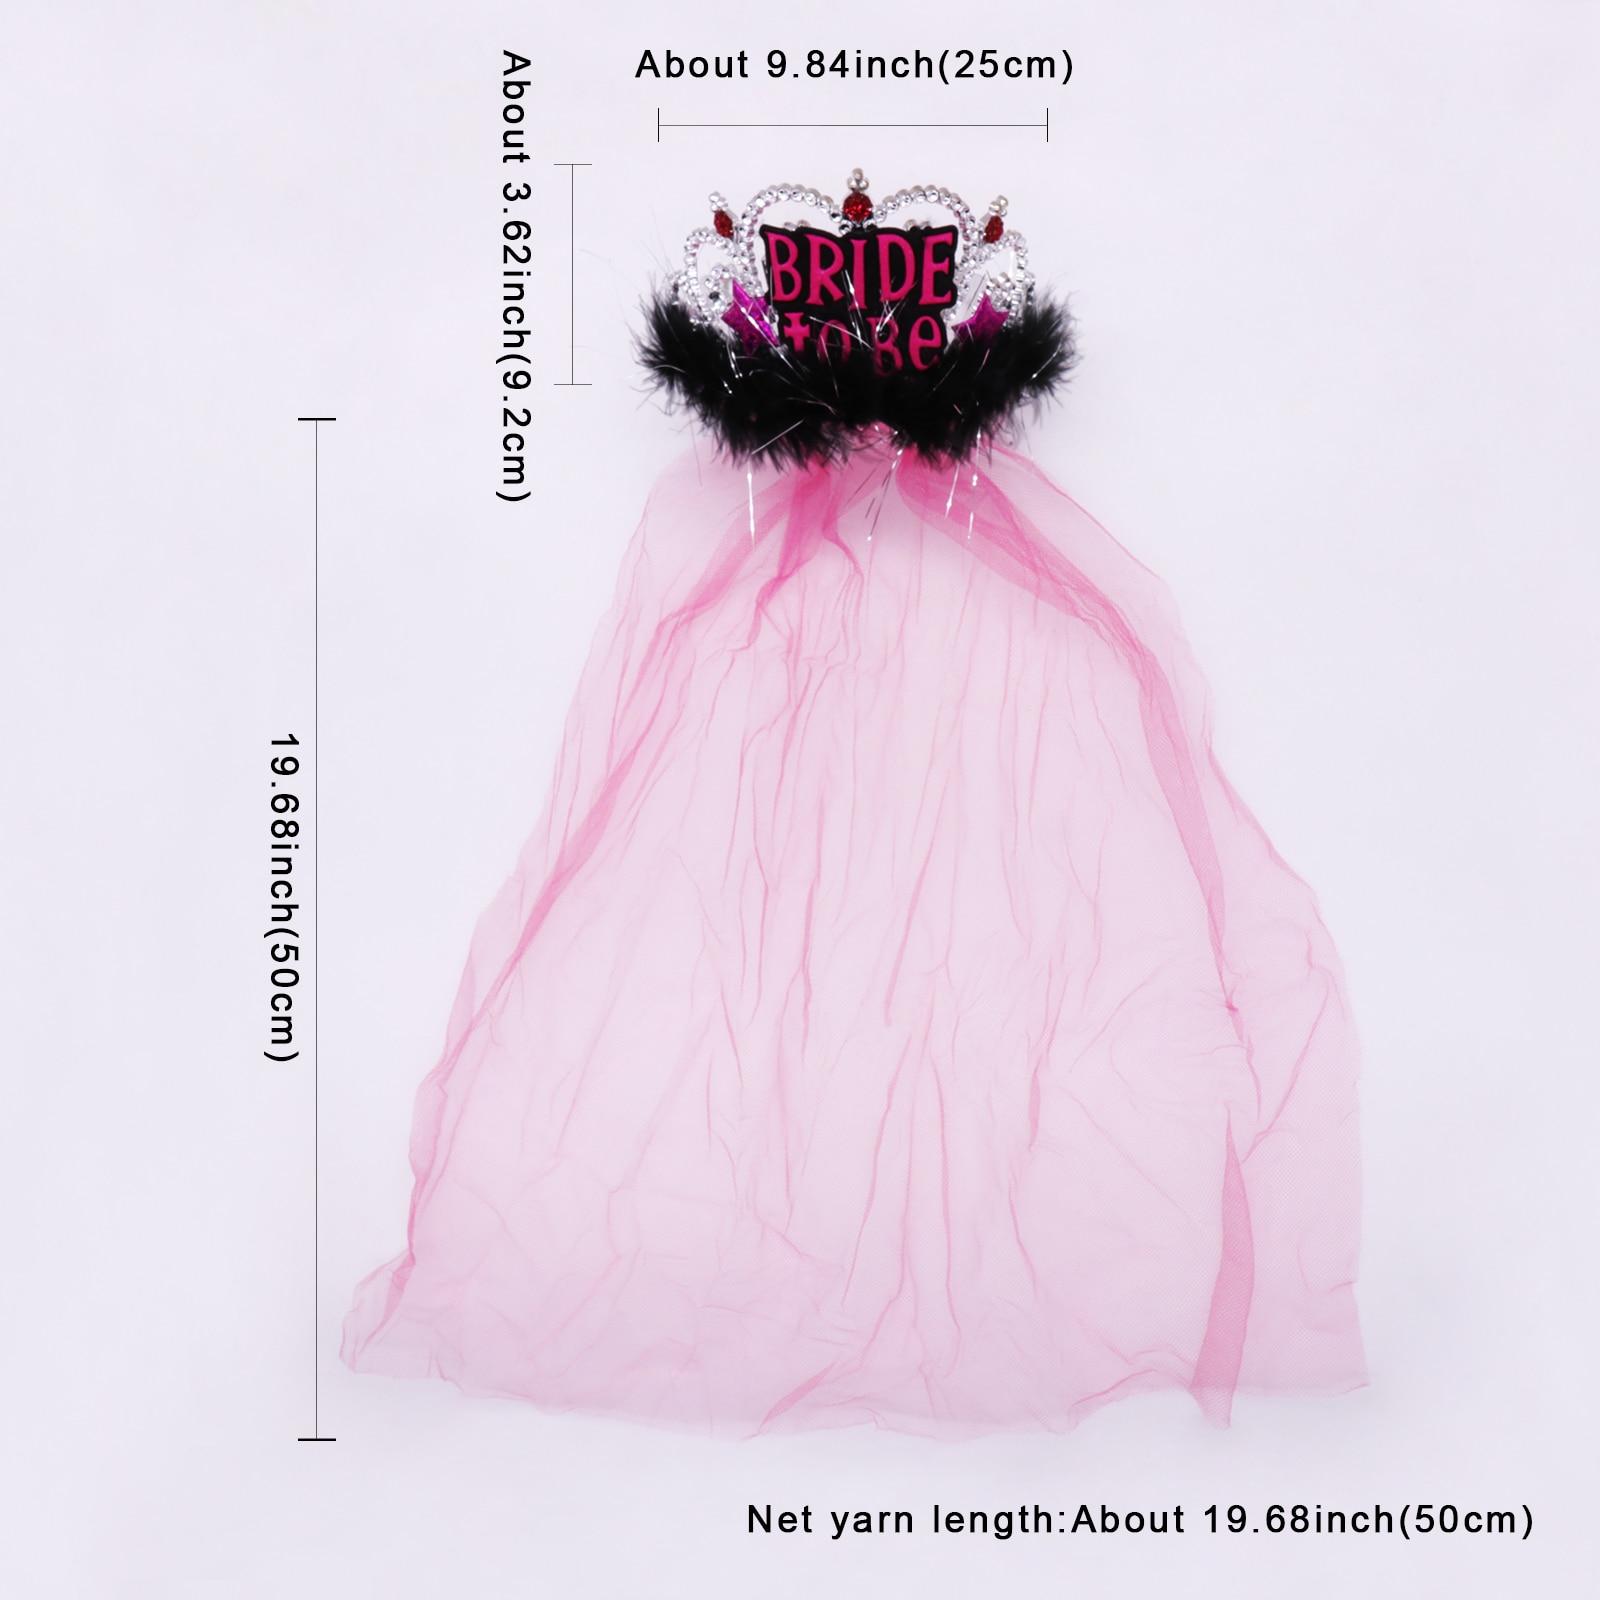 Купить с кэшбэком Bridal to be Pink black Crown veil girls favor Bachelorette party headwear bridesmaid team party decorations bridal accessories